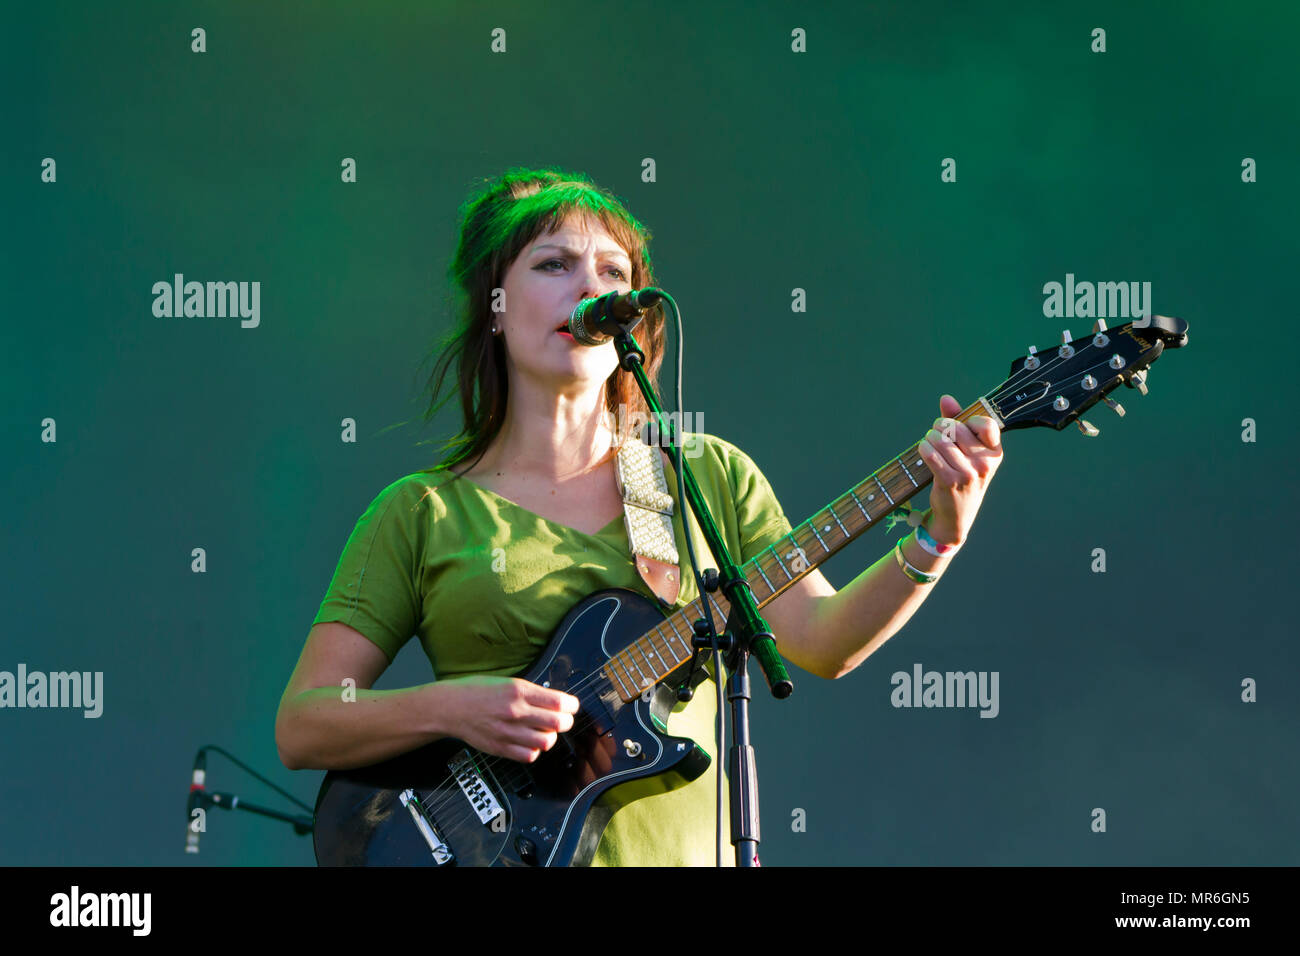 Engel Olsen Sänger führt im Konzert Stockfoto